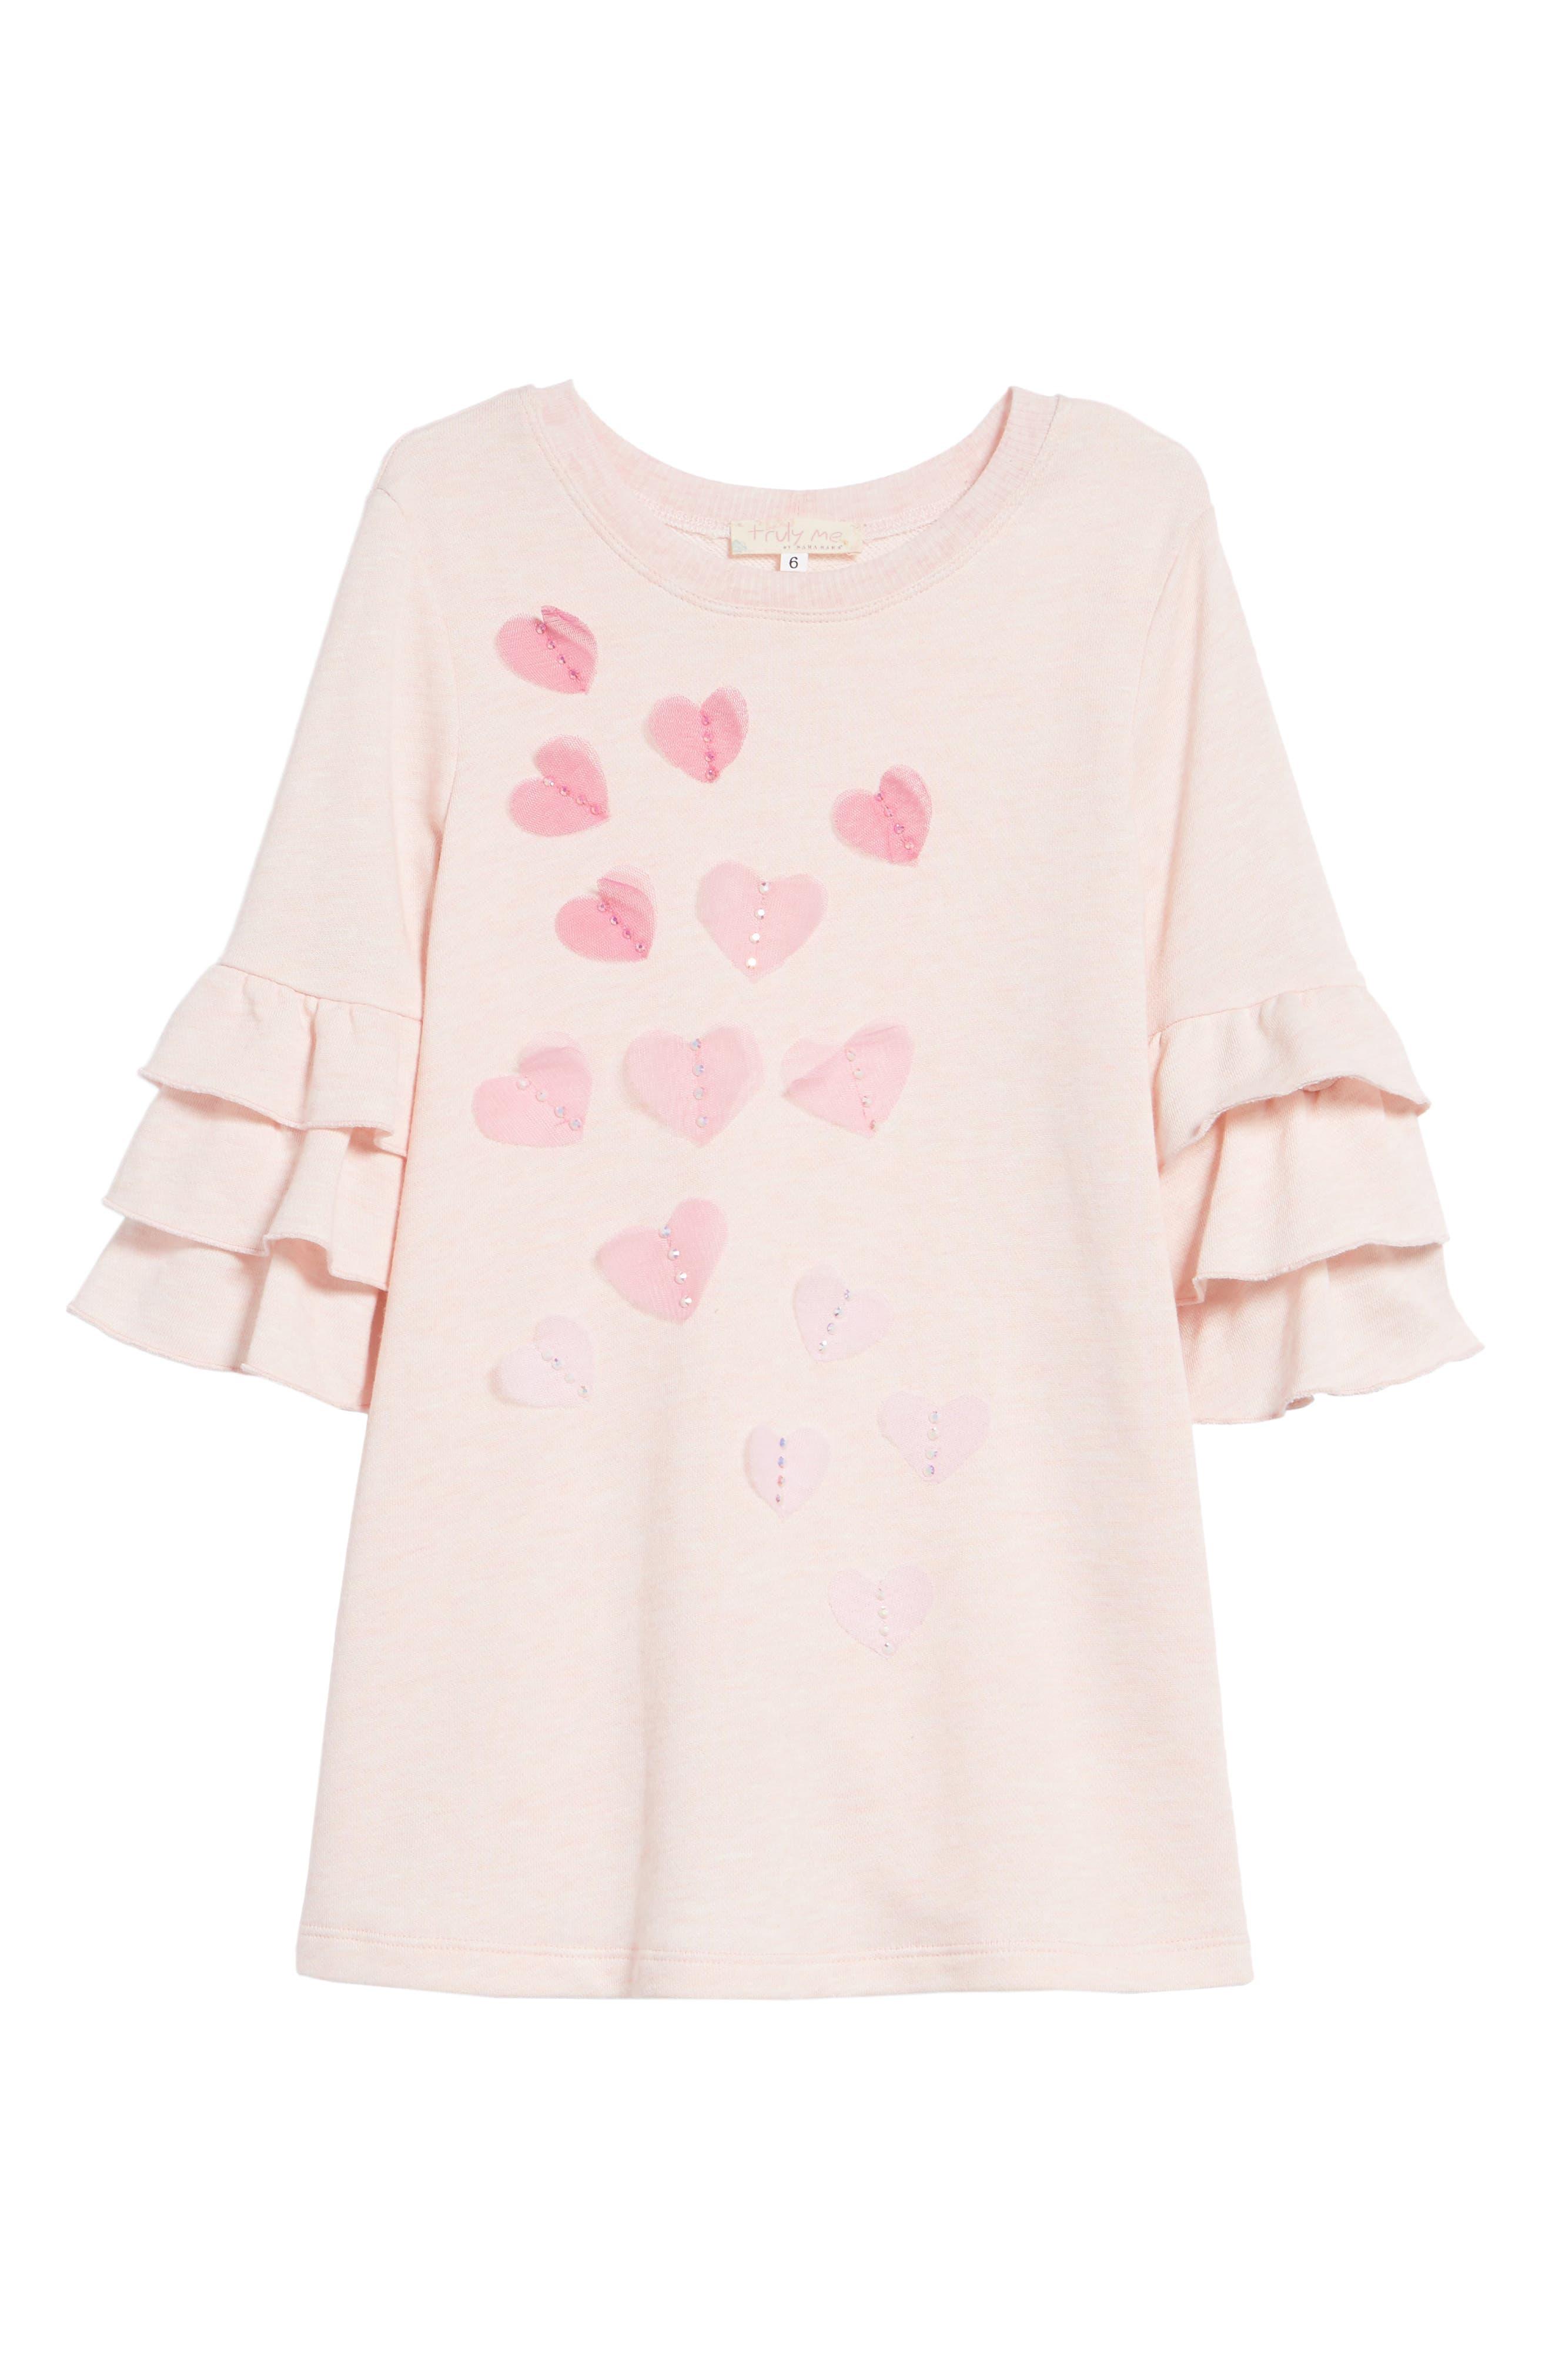 Main Image - Truly Me Ruffle Sleeve Dress (Toddler Girls & Little Girls)